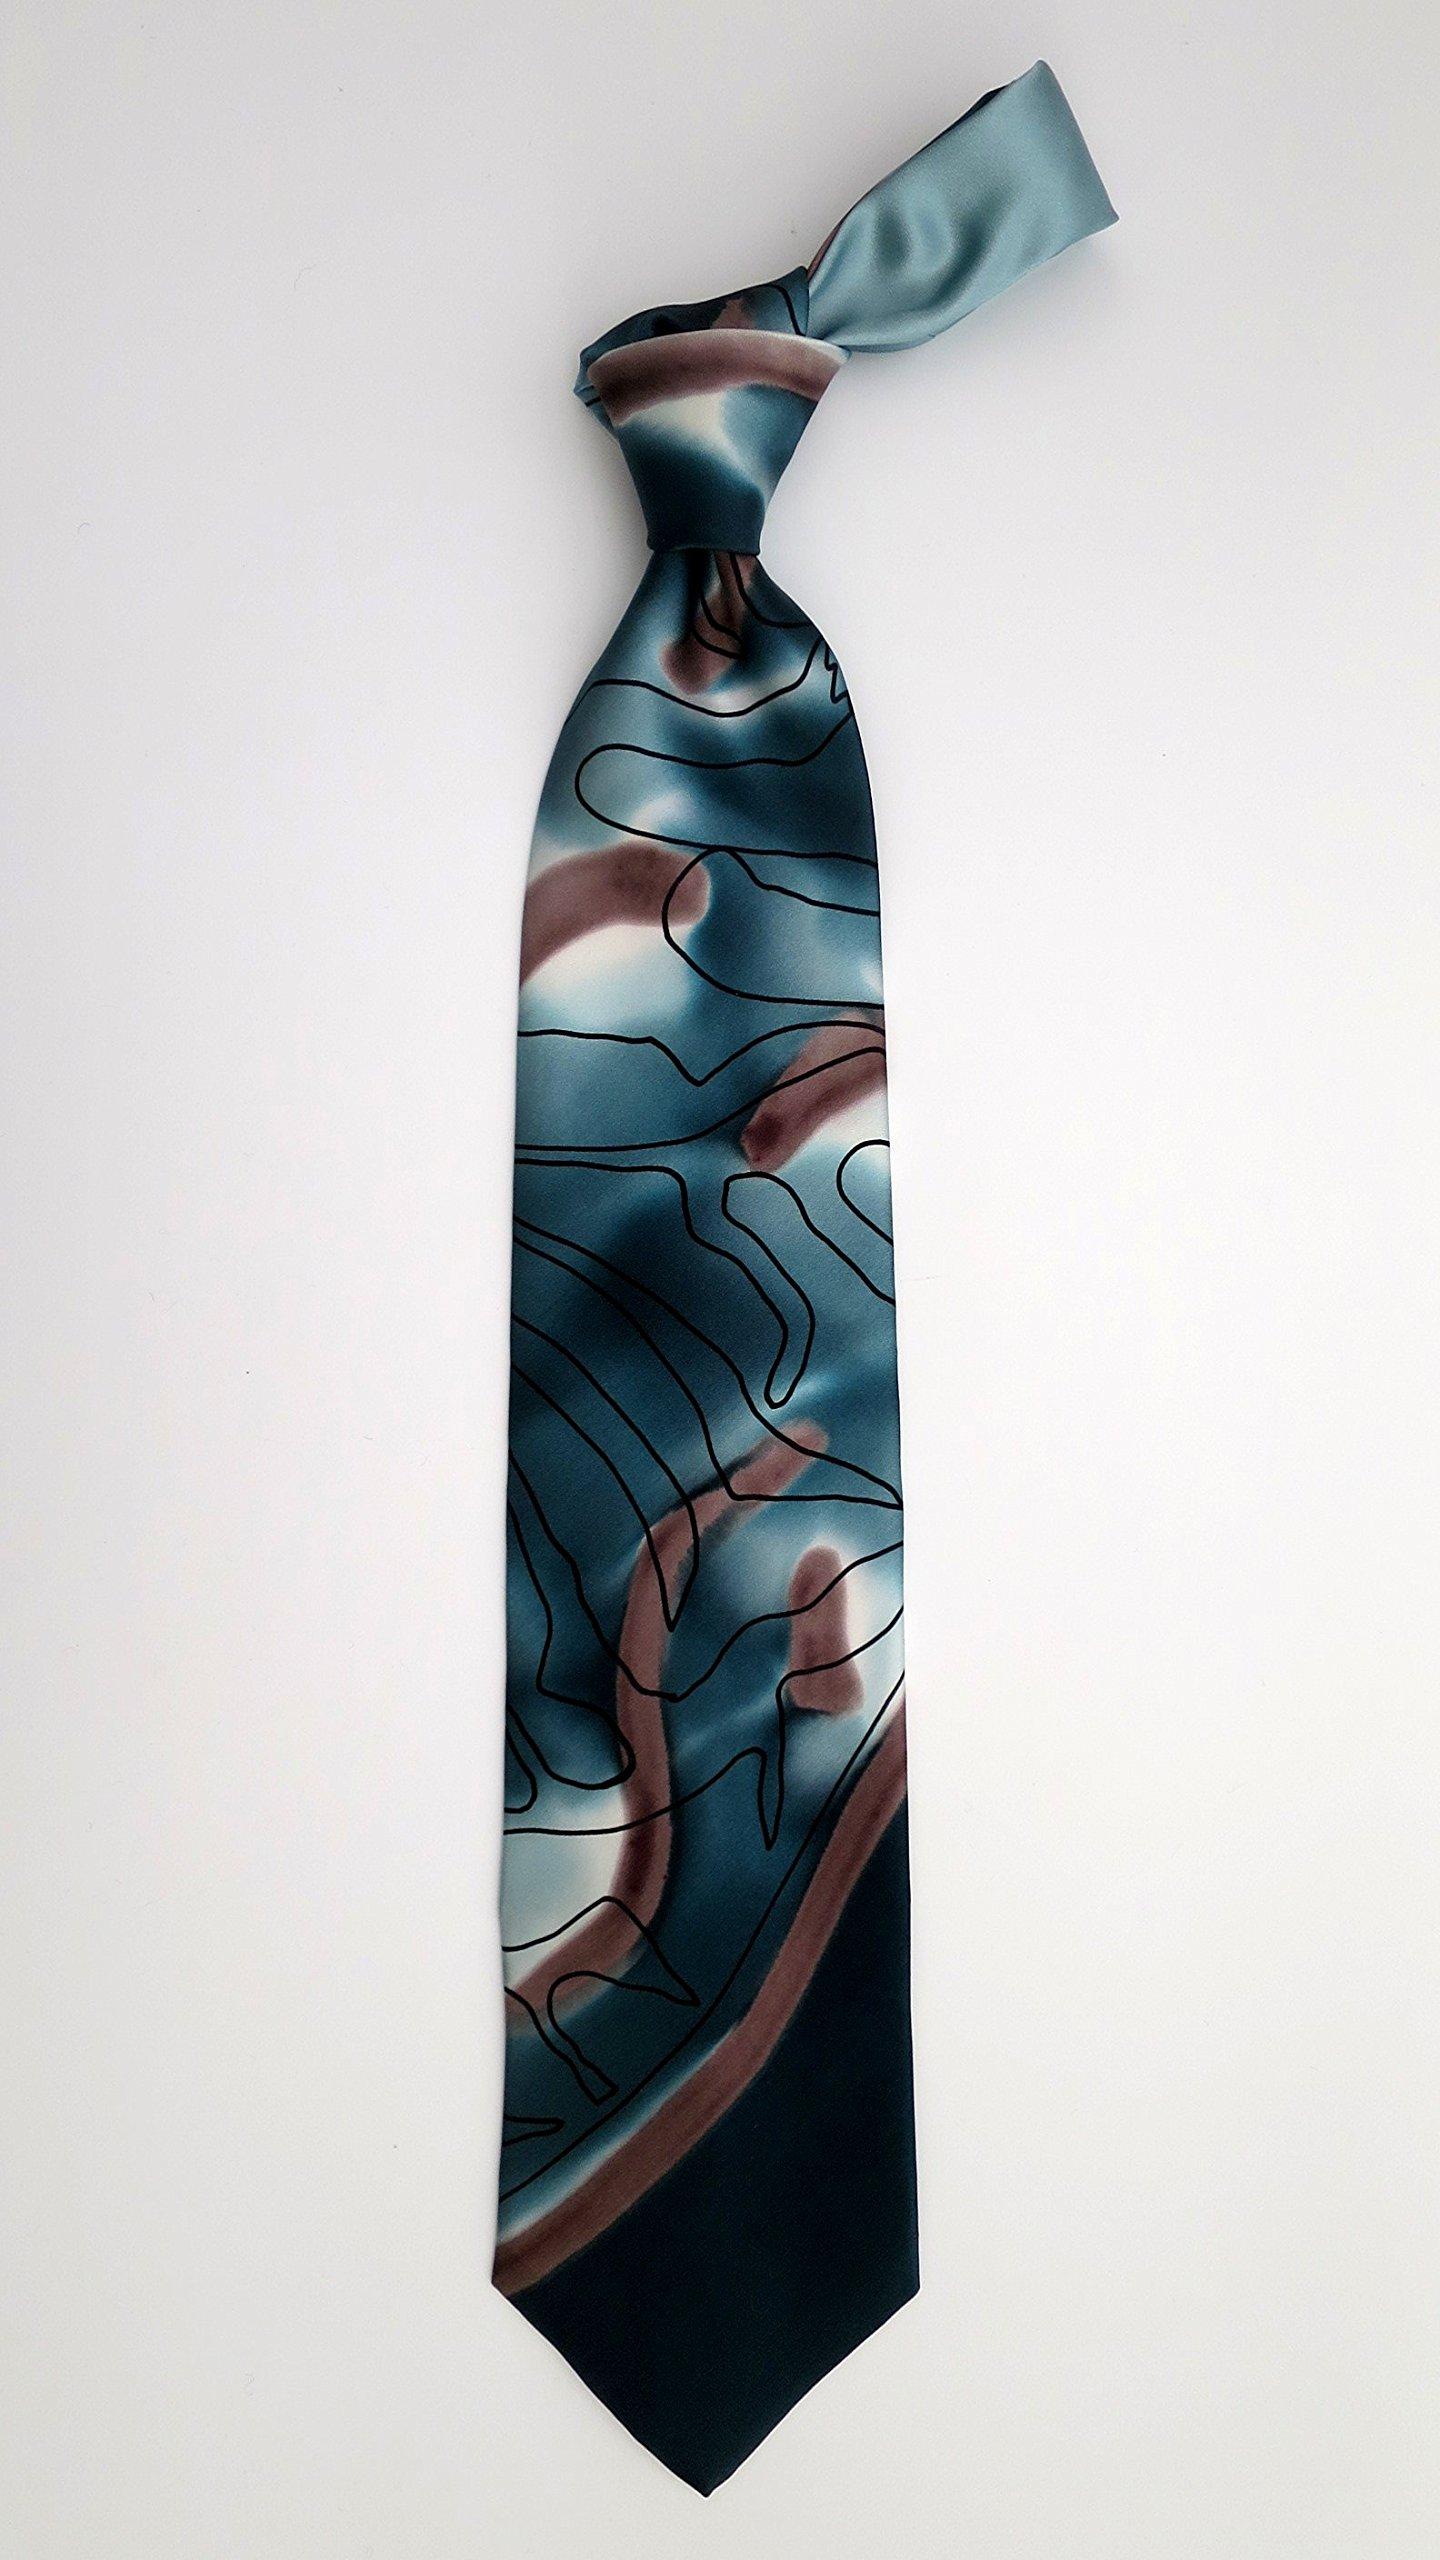 100% Silk Hand-Painted Hand-Made Men's Necktie ''Reptile'' Art to Wear by Murphyties by Murphyties Inc.